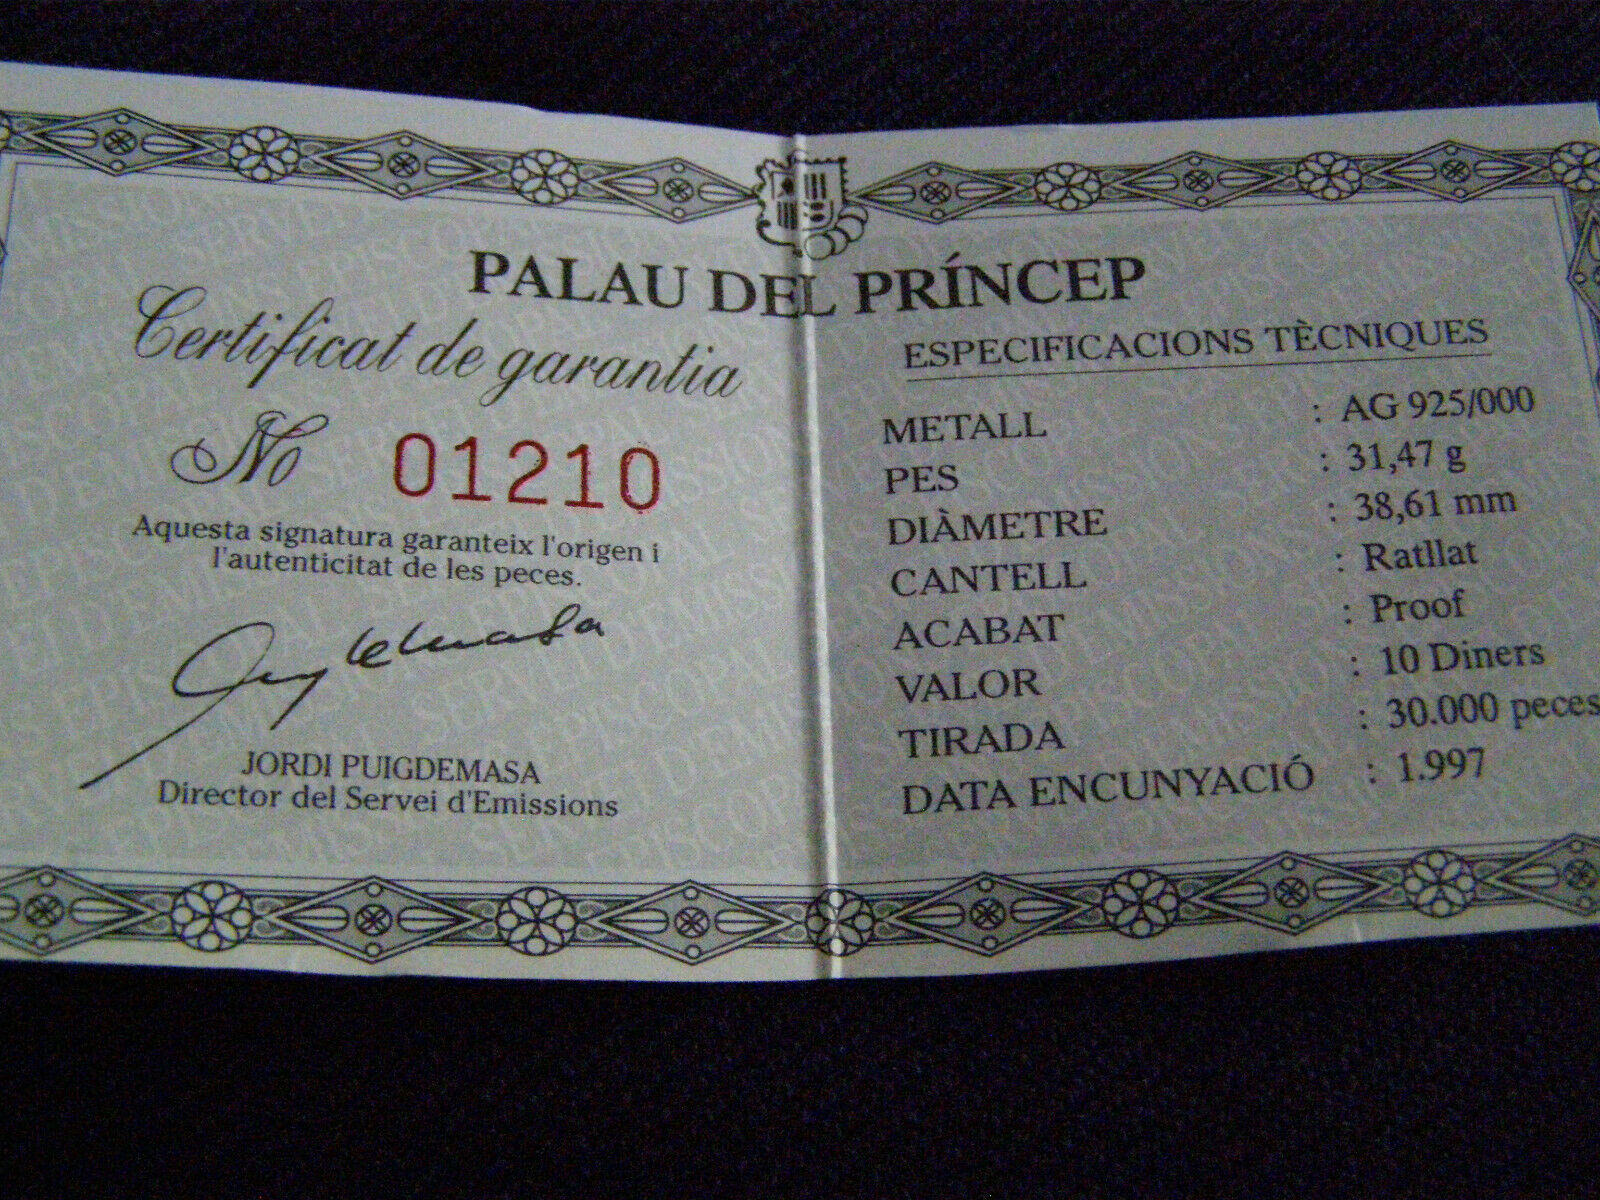 Andorra 10 Diners 1997 925 Silber 31,47g PP Palau Del Princep Limitirt 30.000st. - 28,00 €